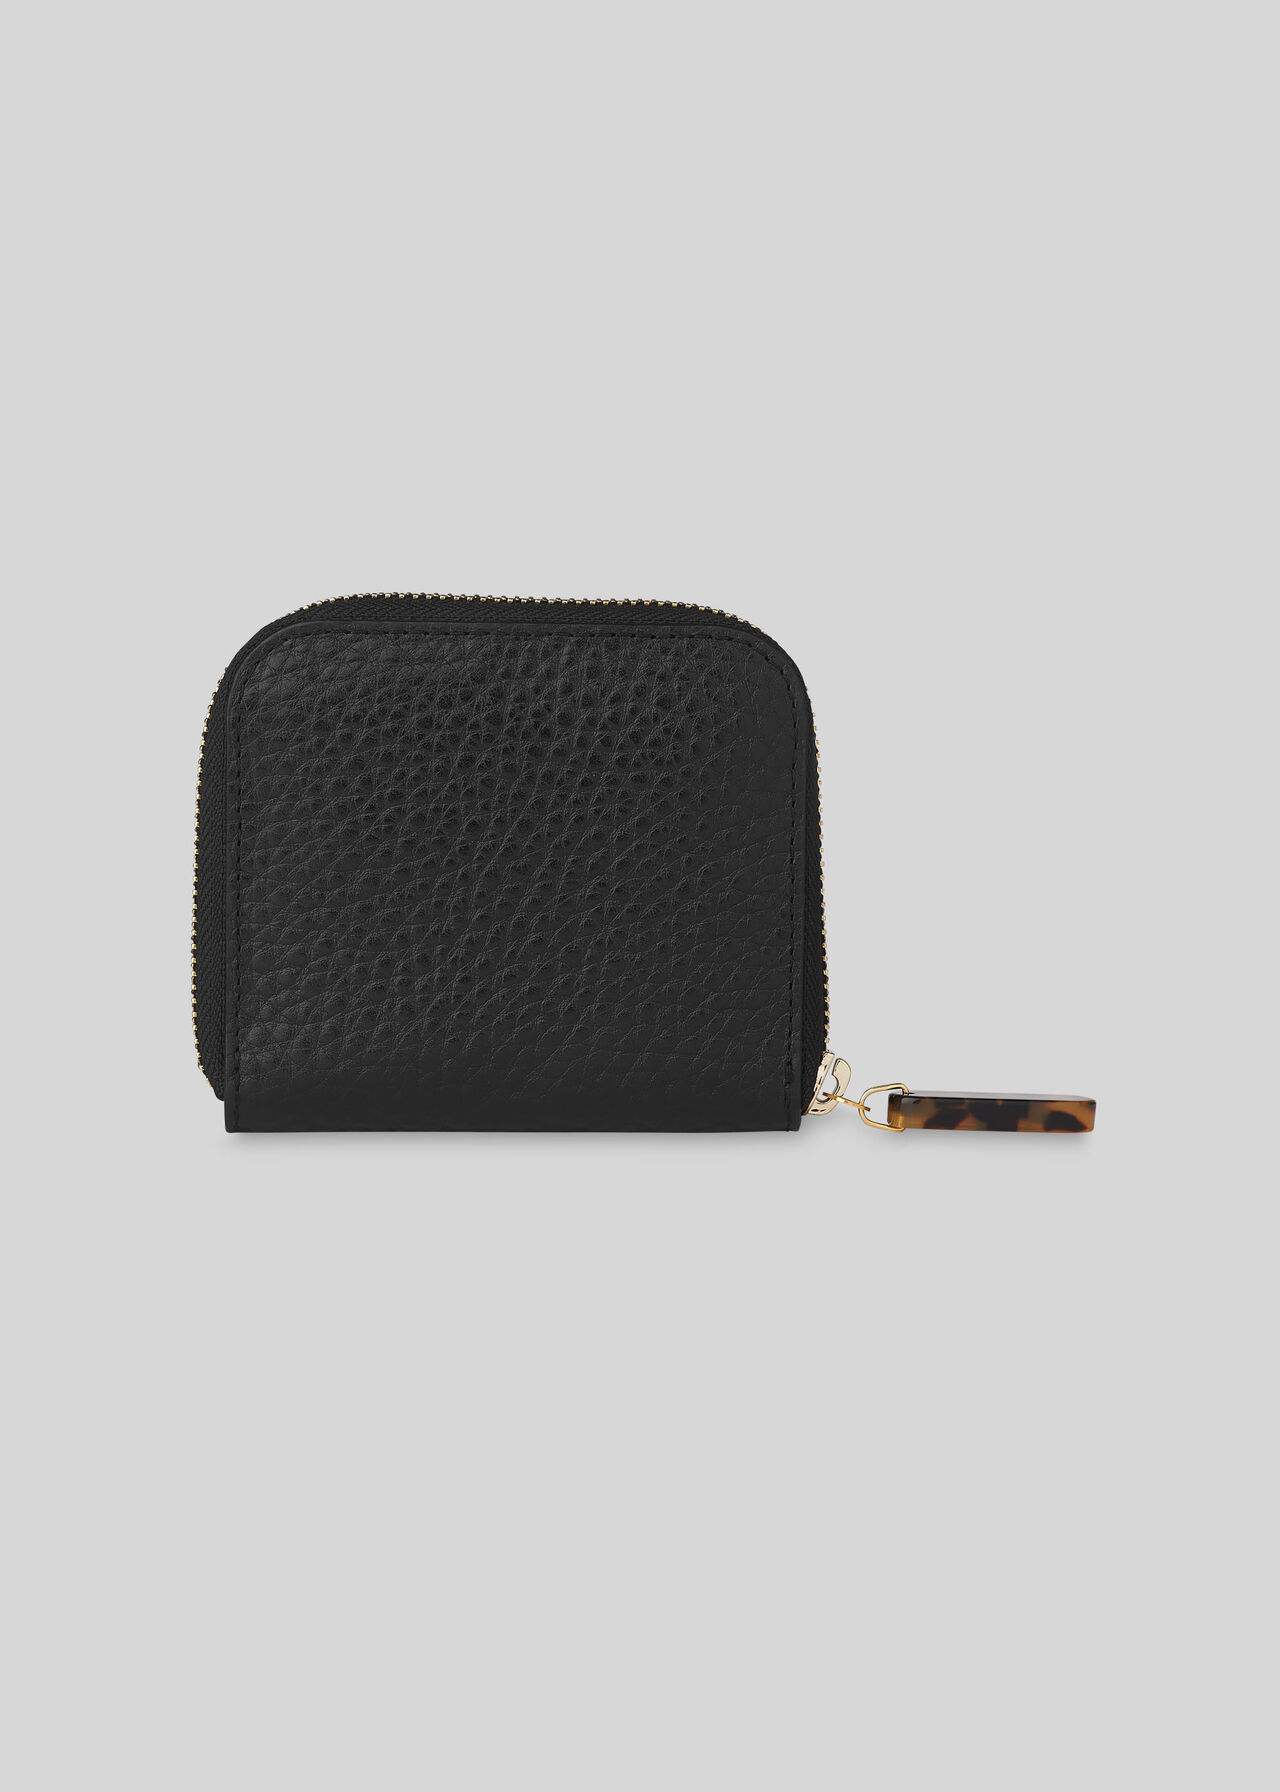 Murray Resin Zip Wallet Black